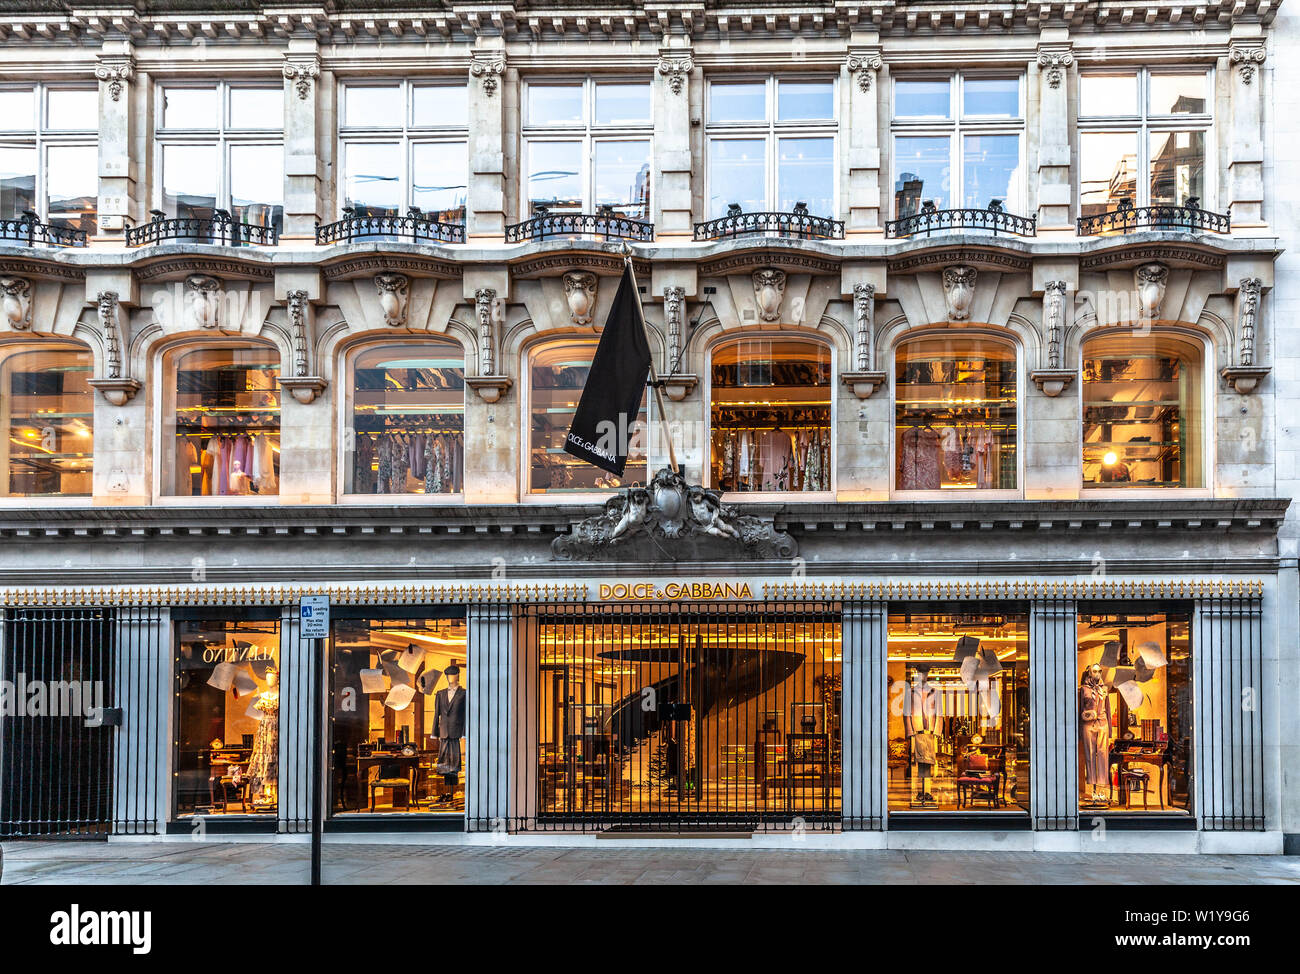 Dolce & Gabbana fashion store, 53-55 New Bond St, Mayfair, London W1S 1DG, England, UK. - Stock Image